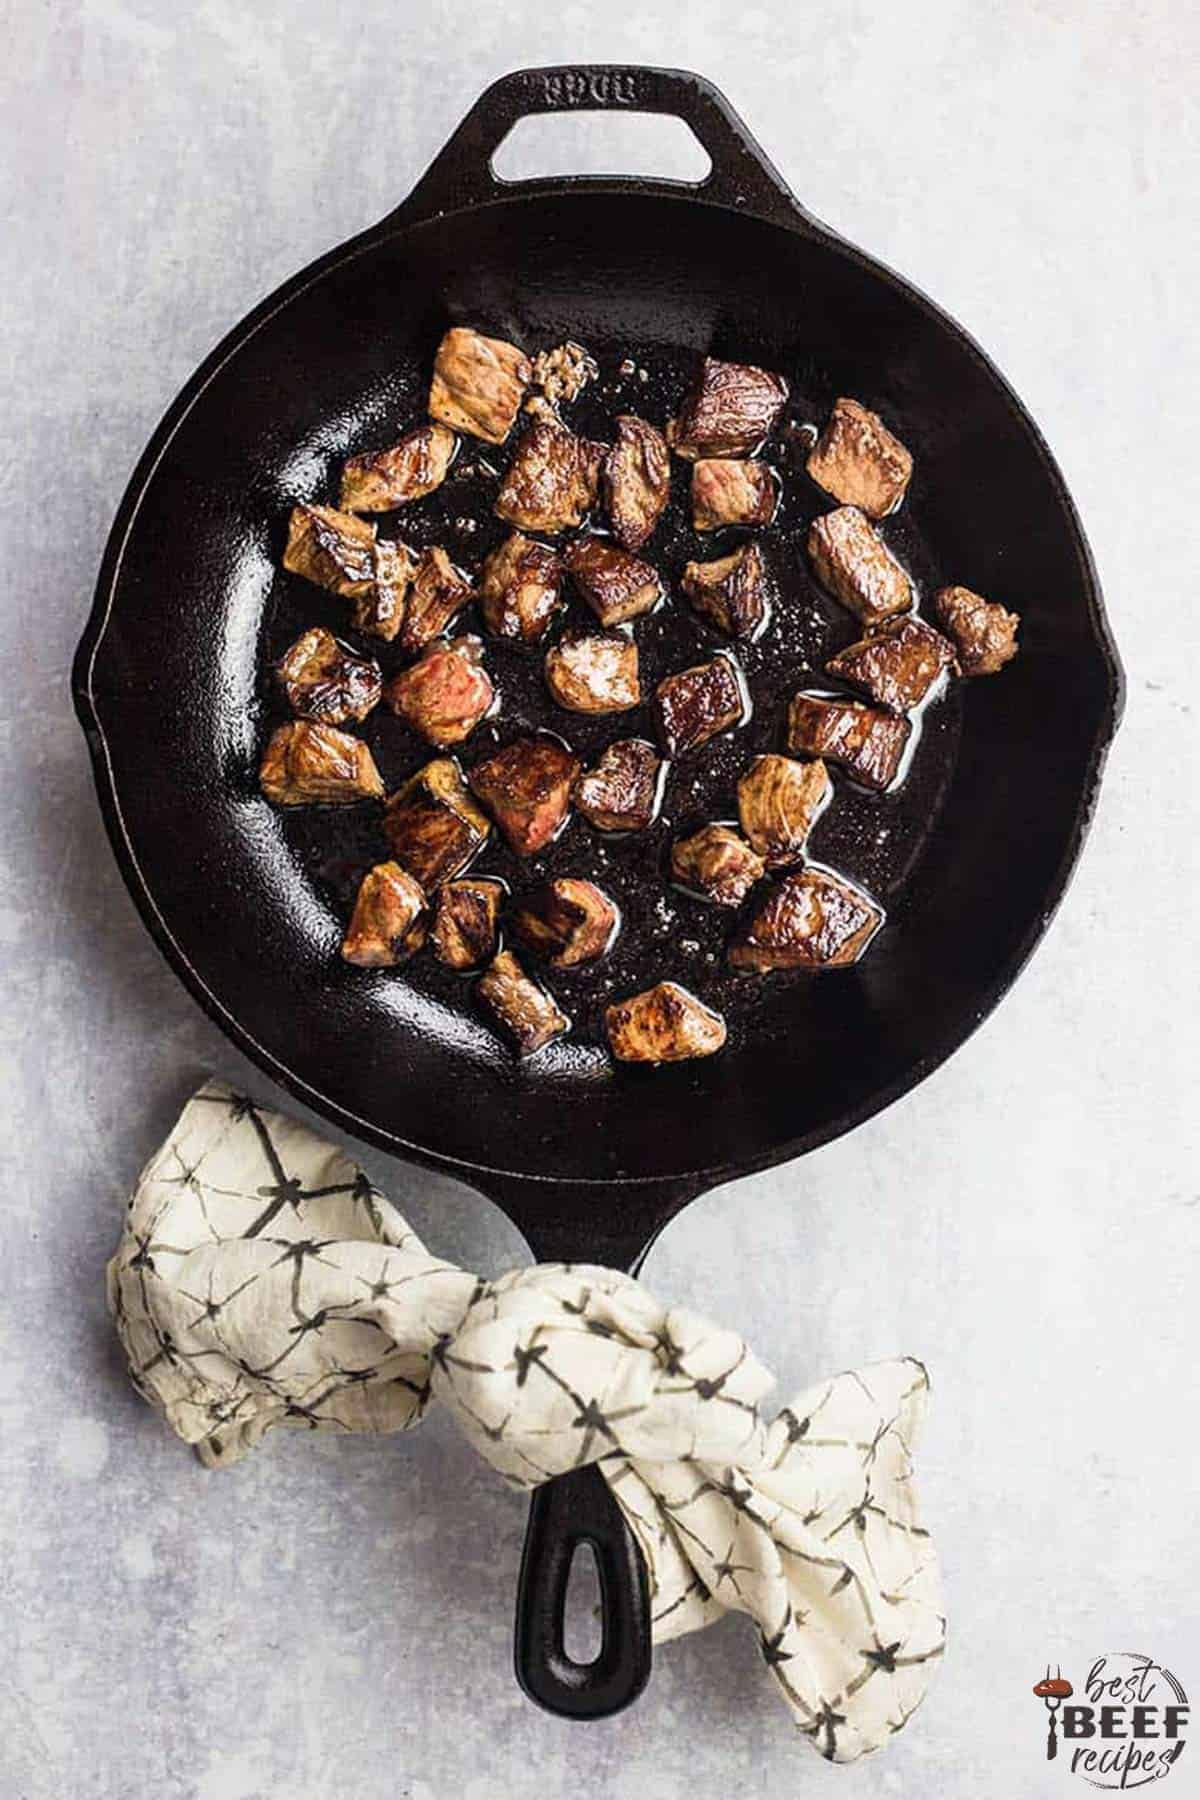 Garlic butter steak bites cooking in a skillet